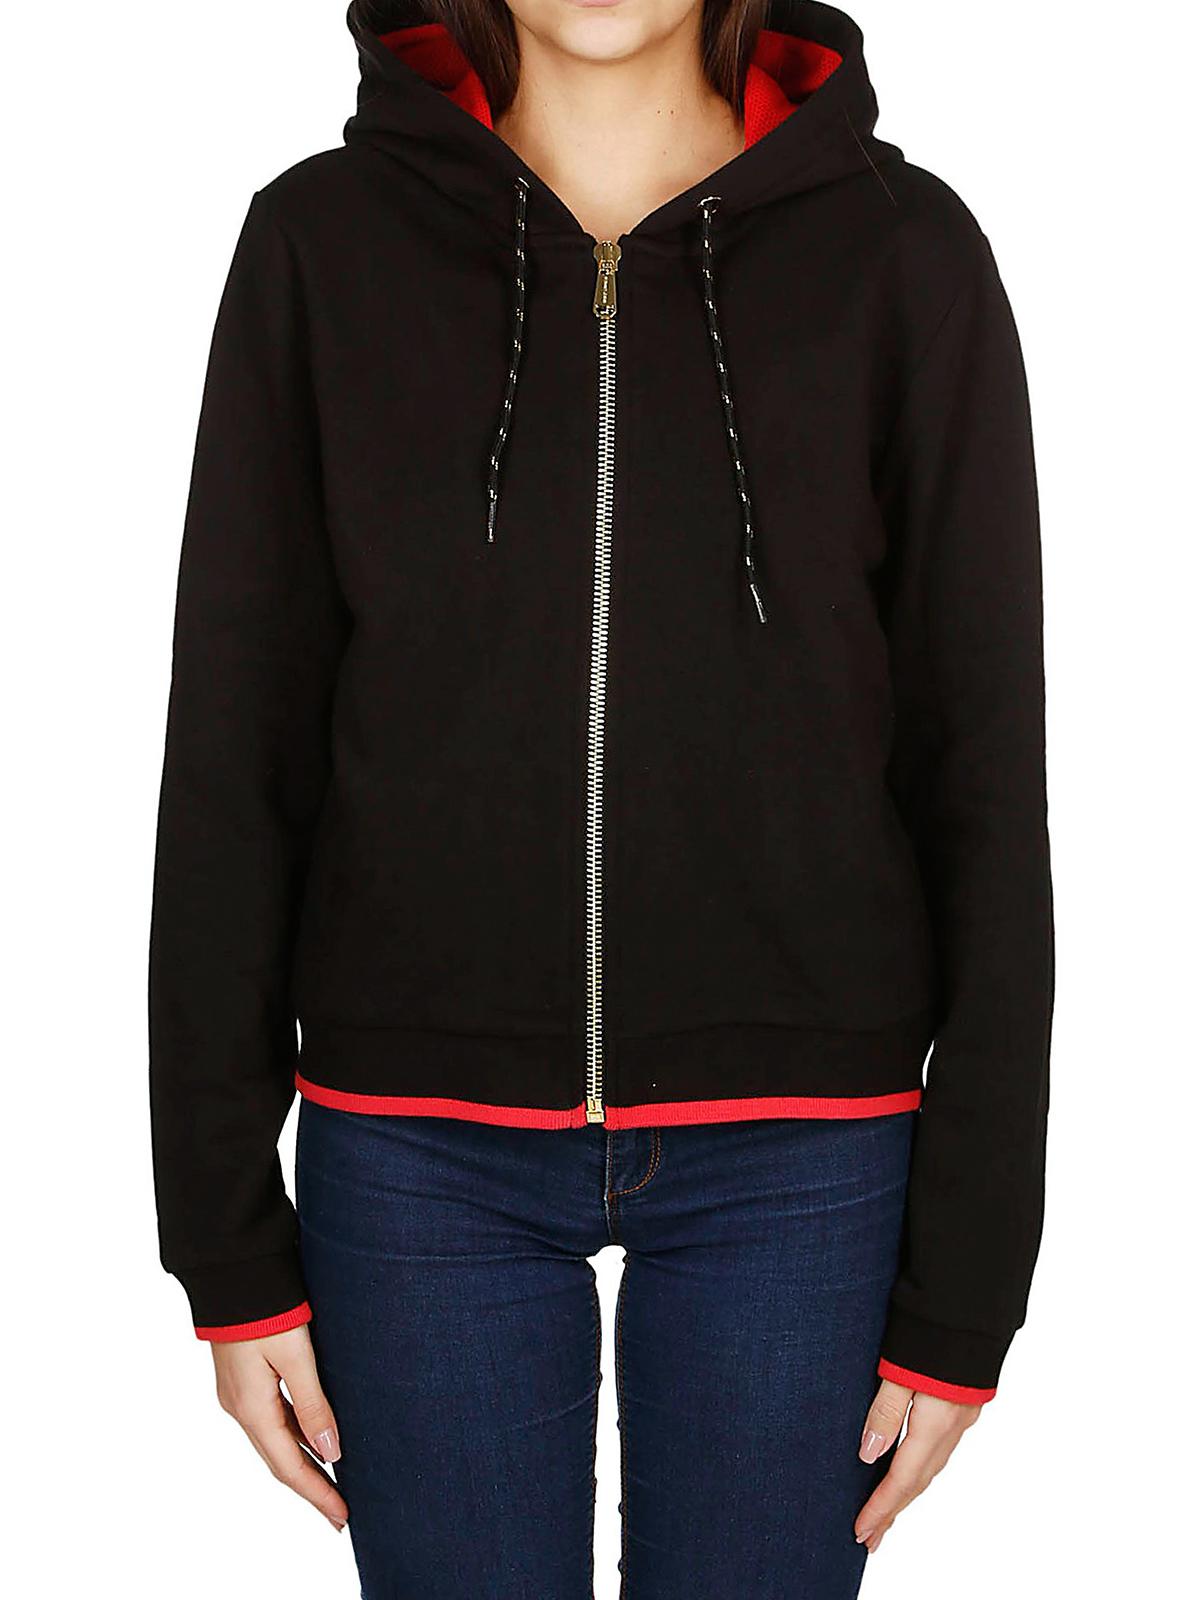 5a3c57ae0b8 iKRIX VERSACE JEANS  Sweatshirts   Pulls - Sweat-Shirts - Noir